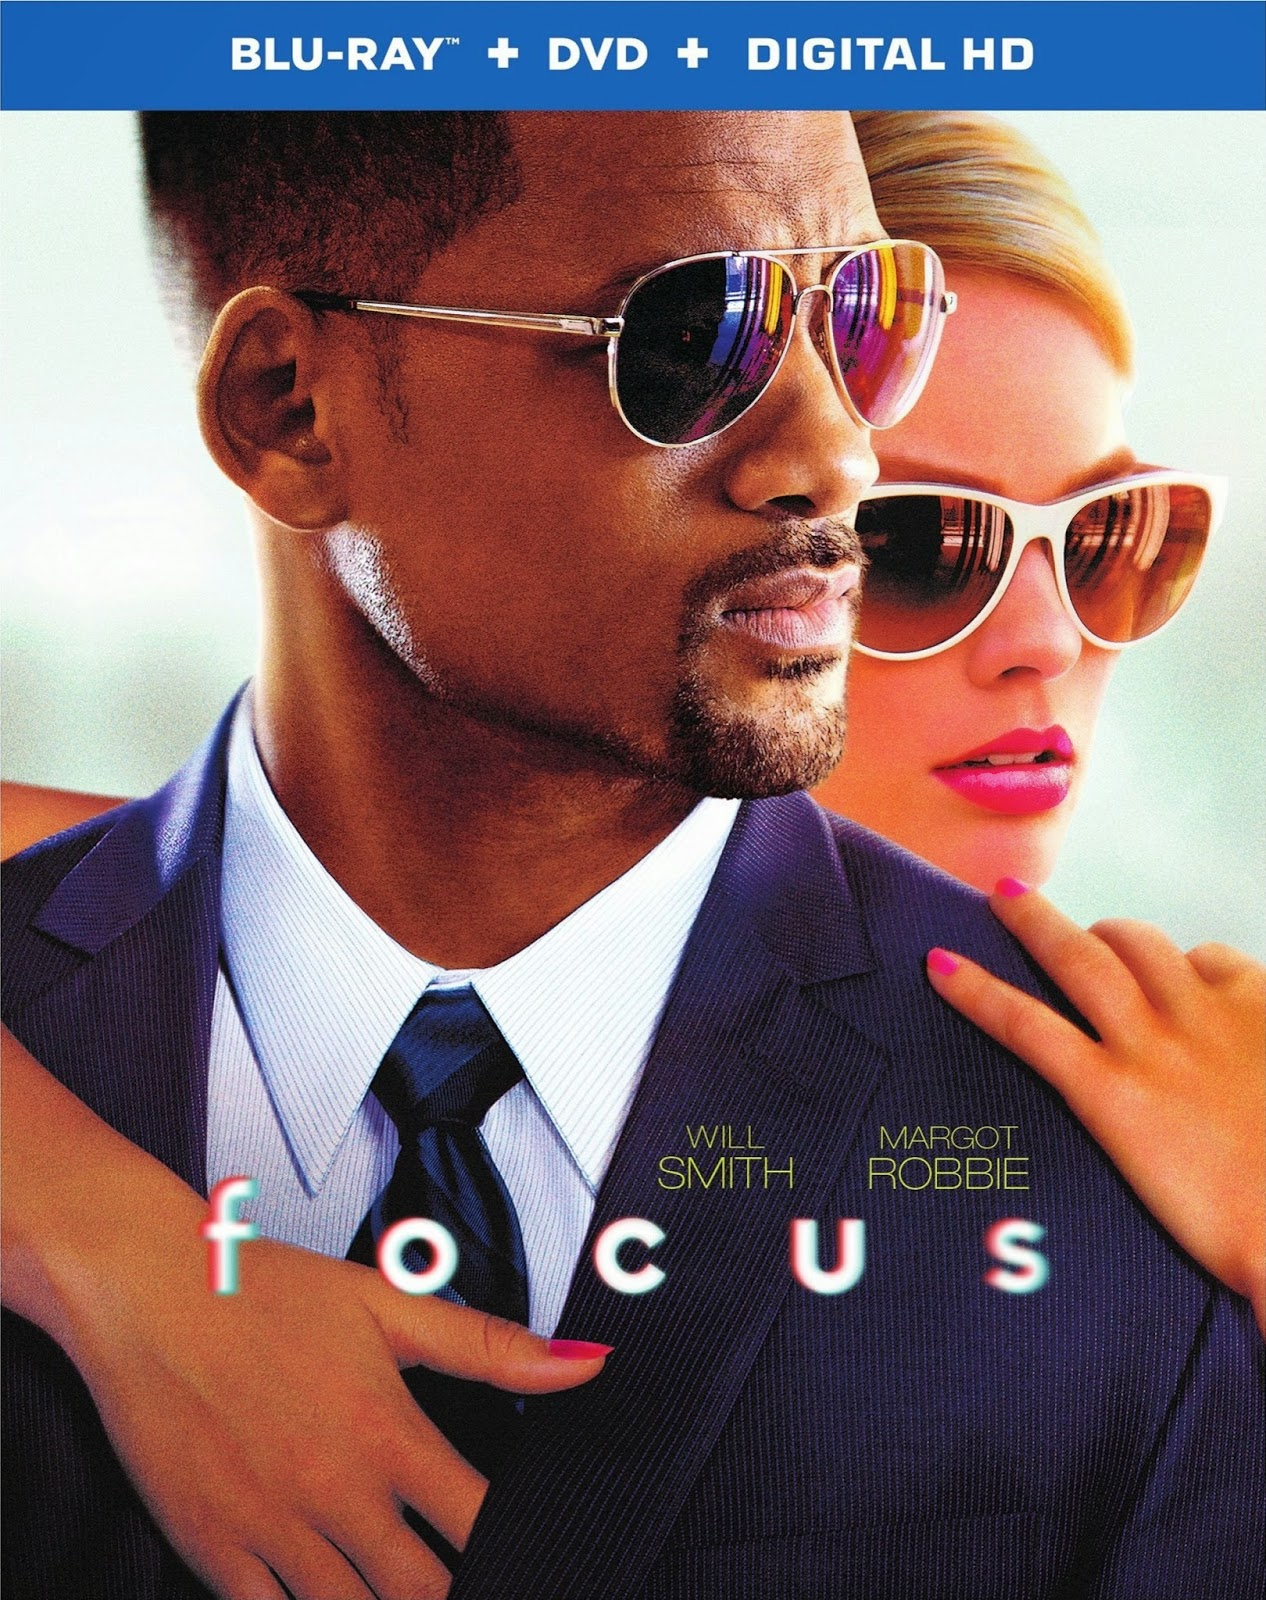 Focus (2015) 1080p BD25 Cover Caratula Bluray